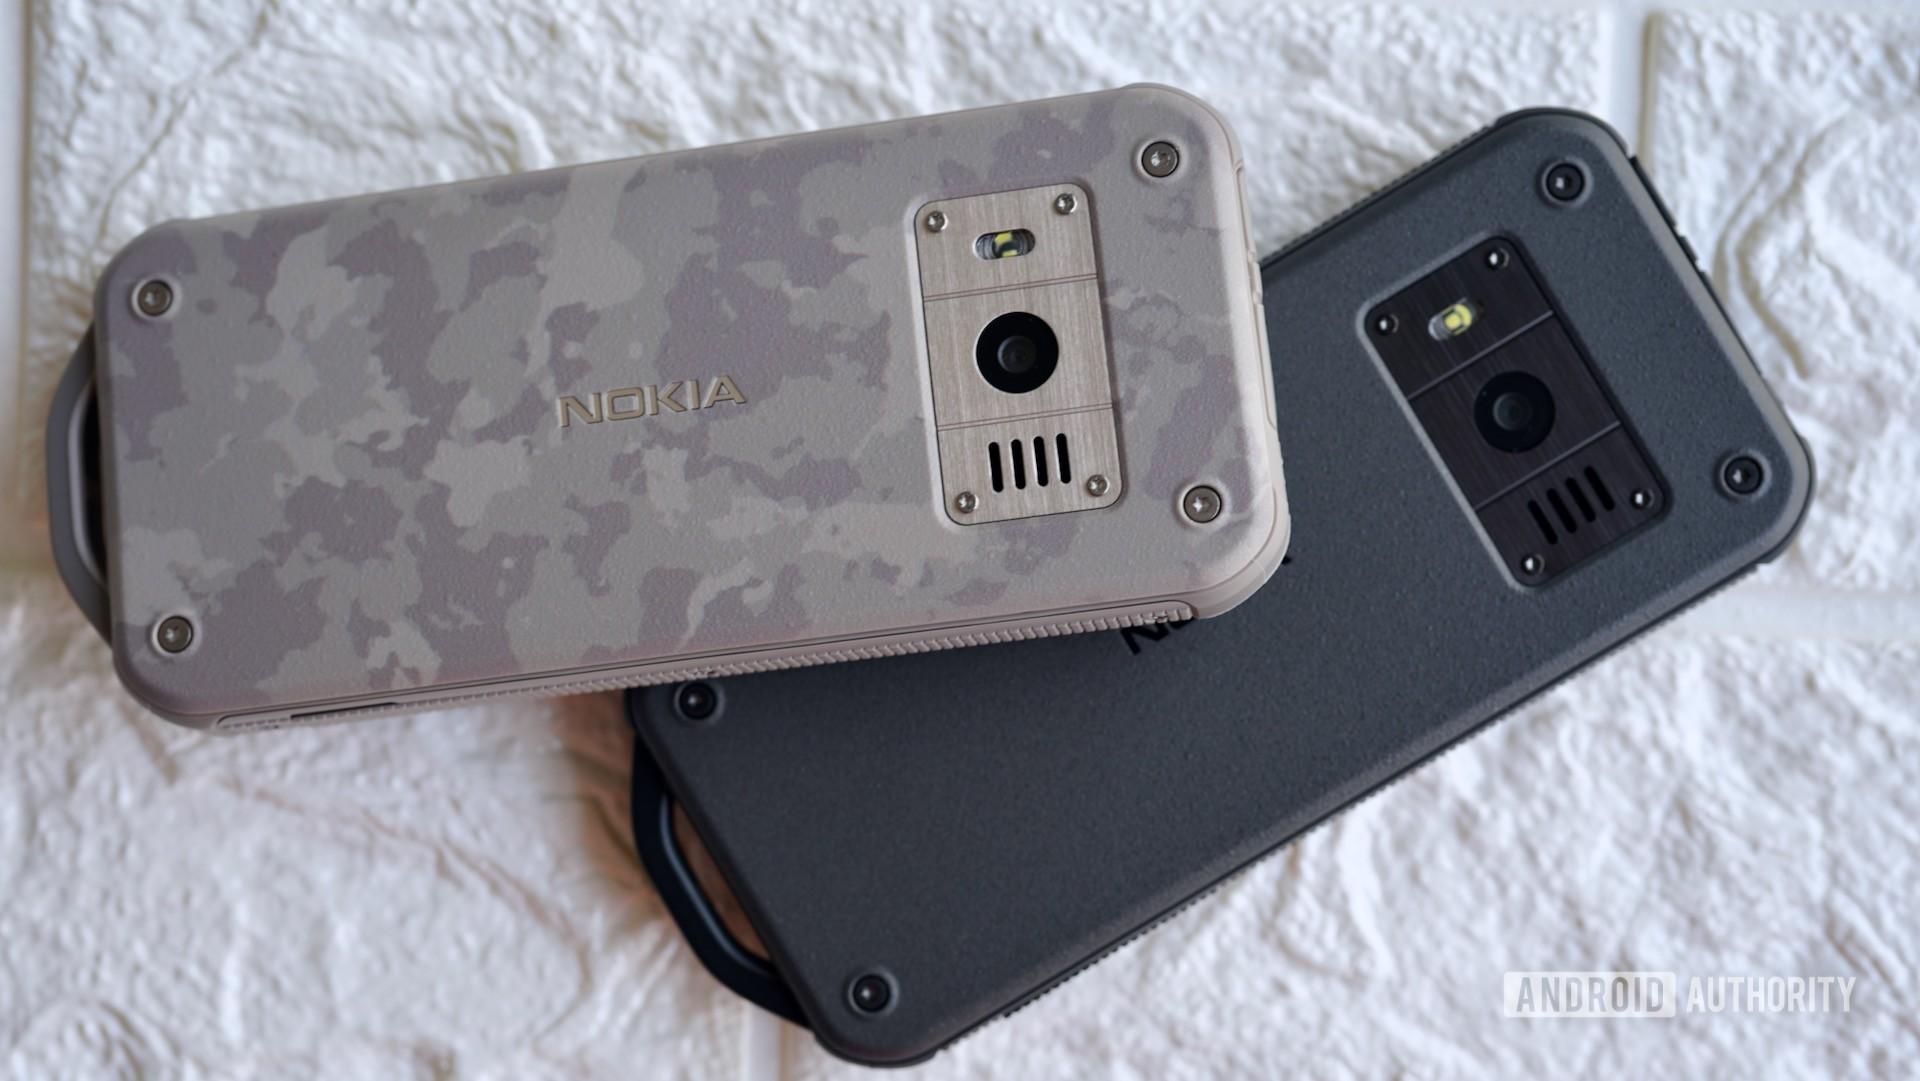 Nokia-800-Tough-camo-and-black..jpeg